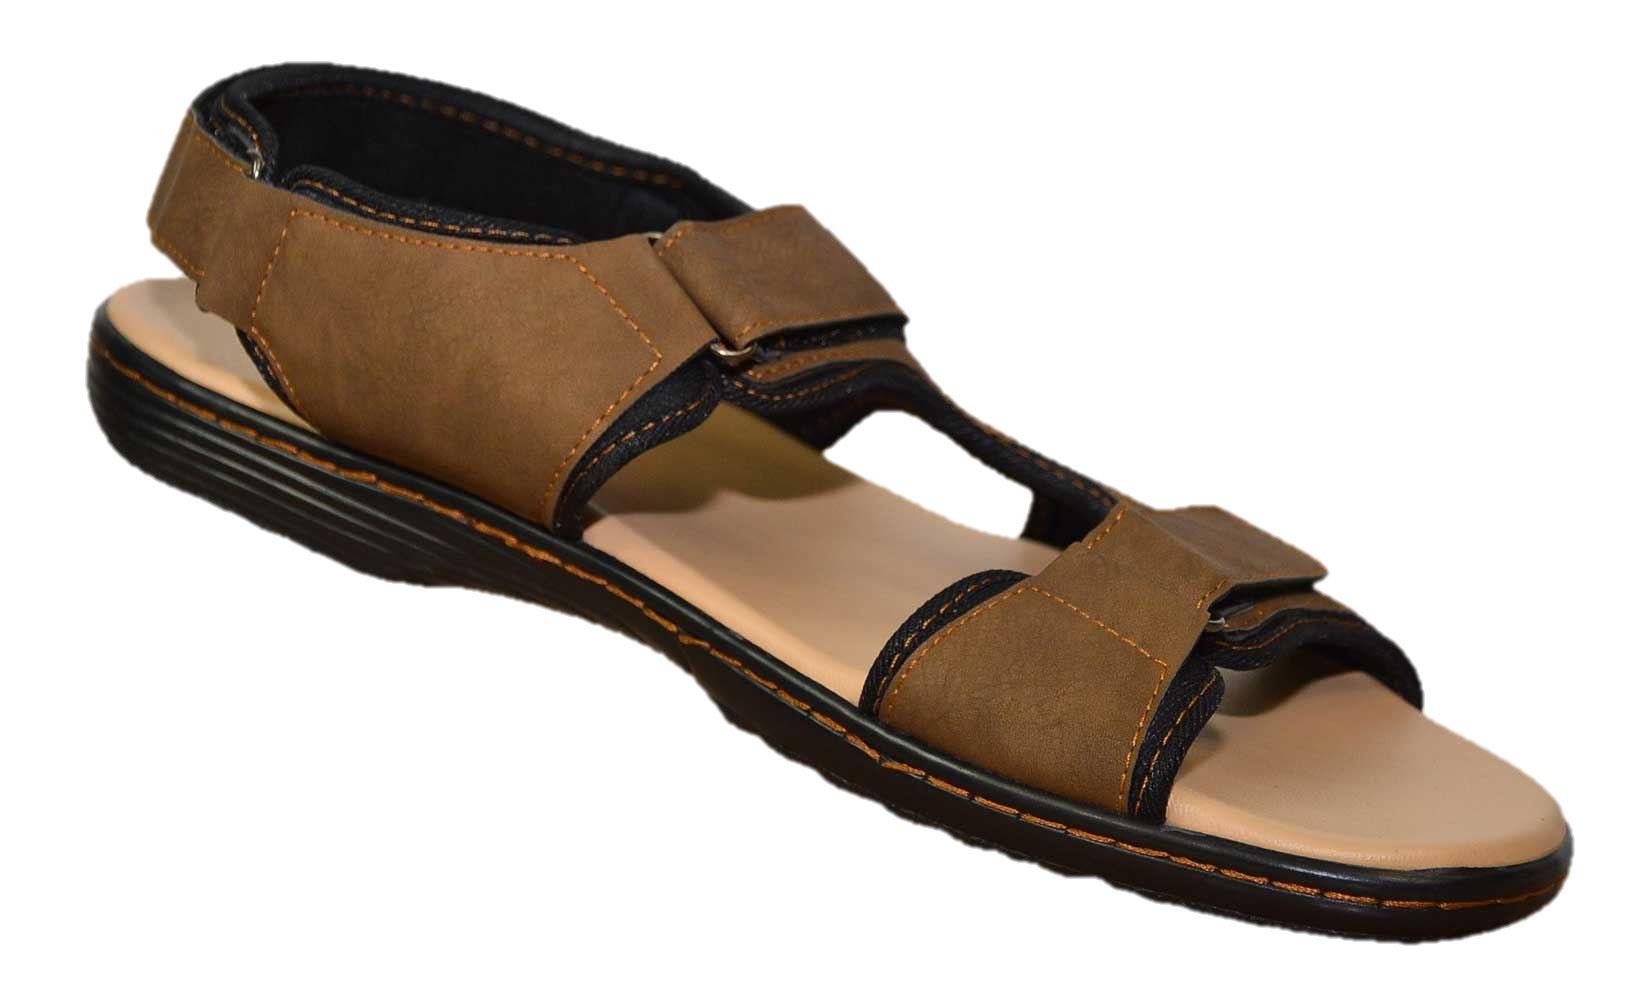 952b16103be1 Mens Sandals Big Foot Adjustable Wide Fit Size 12 13 14 15 Summer ...